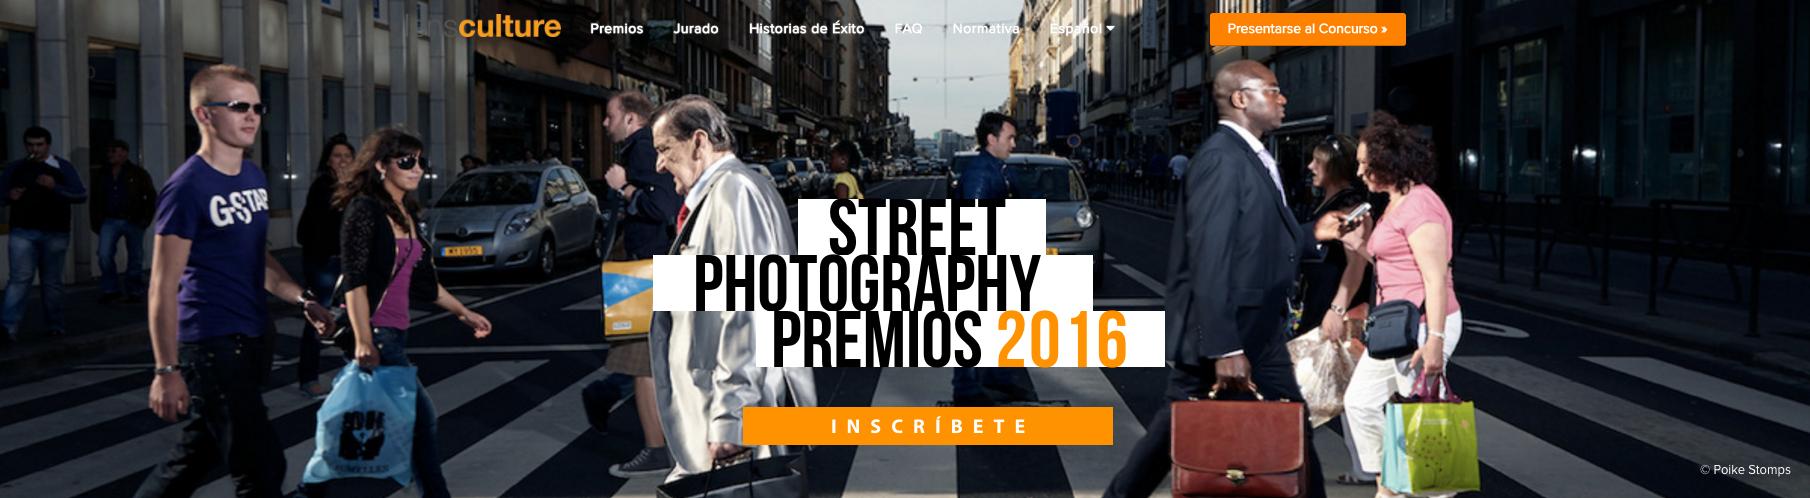 Concurso de fotograf a callejera 2016 aavi blog for Concurso de docencia 2016